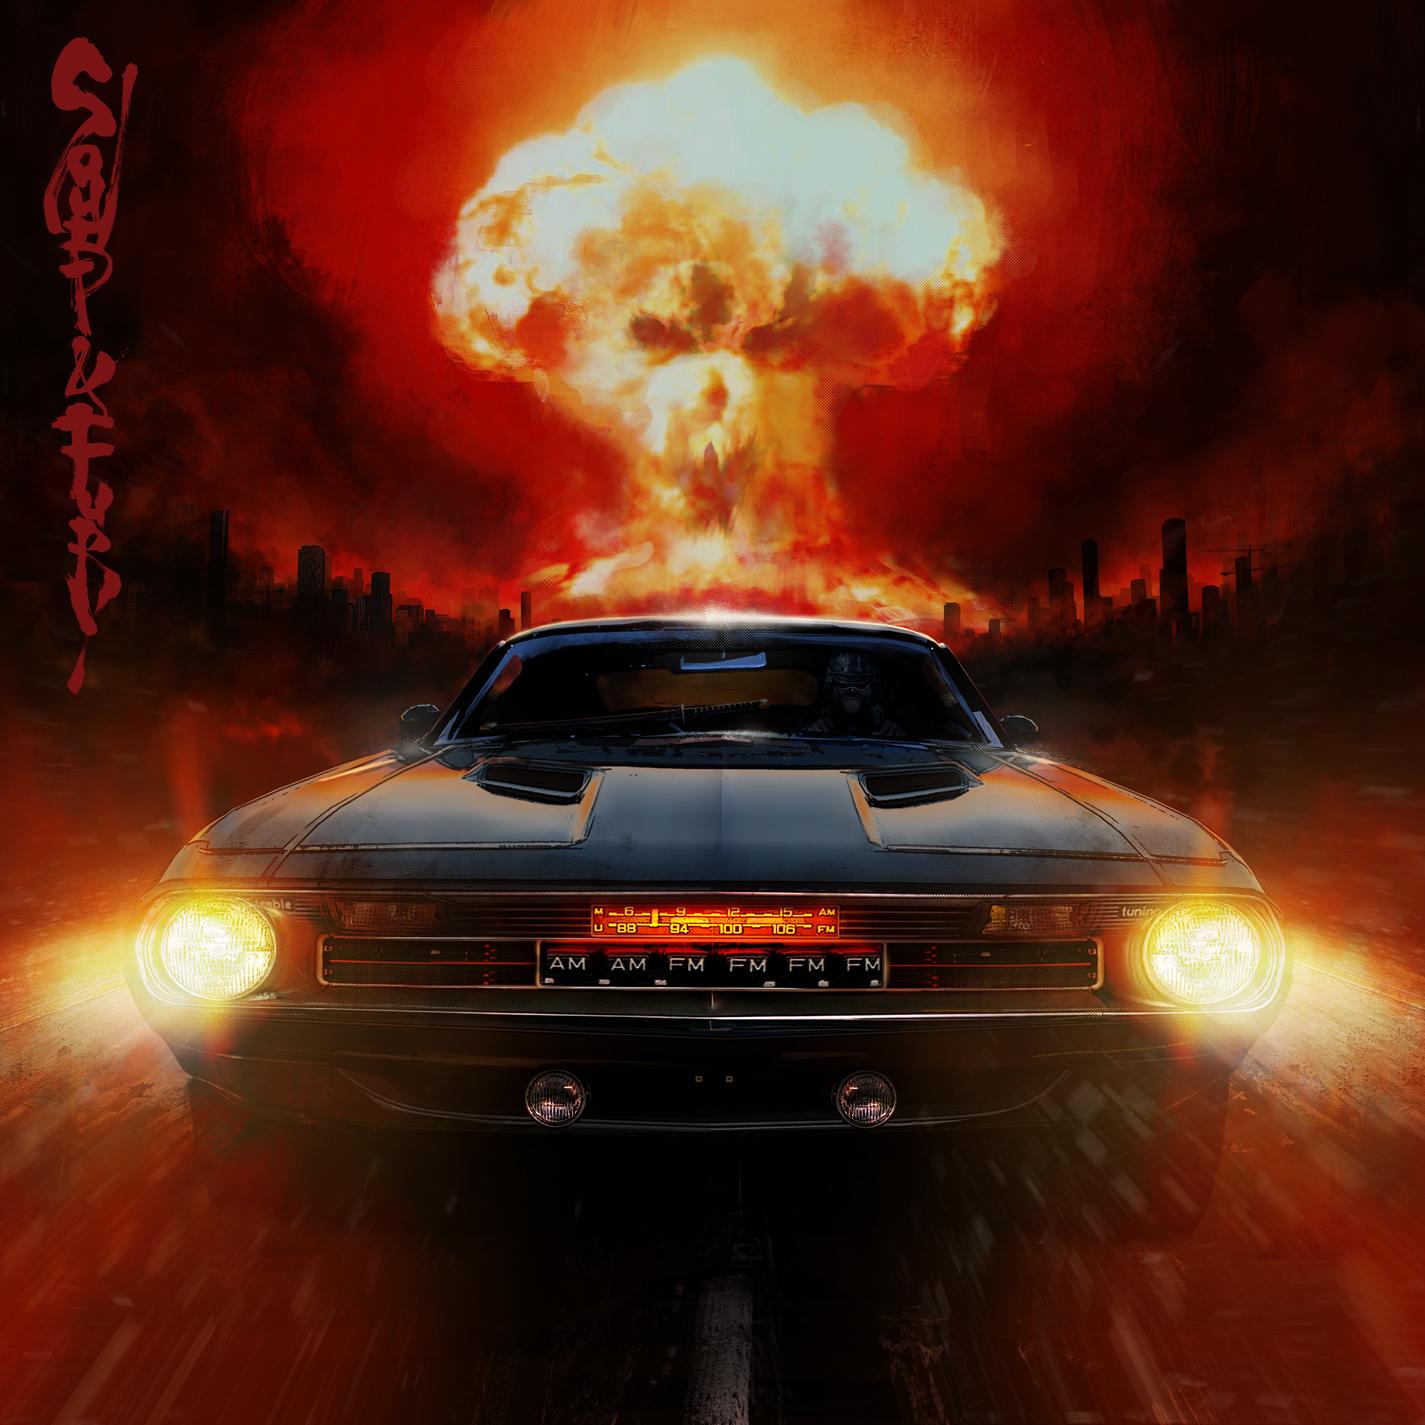 Sturgill-Simpson-Sound-And-fury album cover artwork